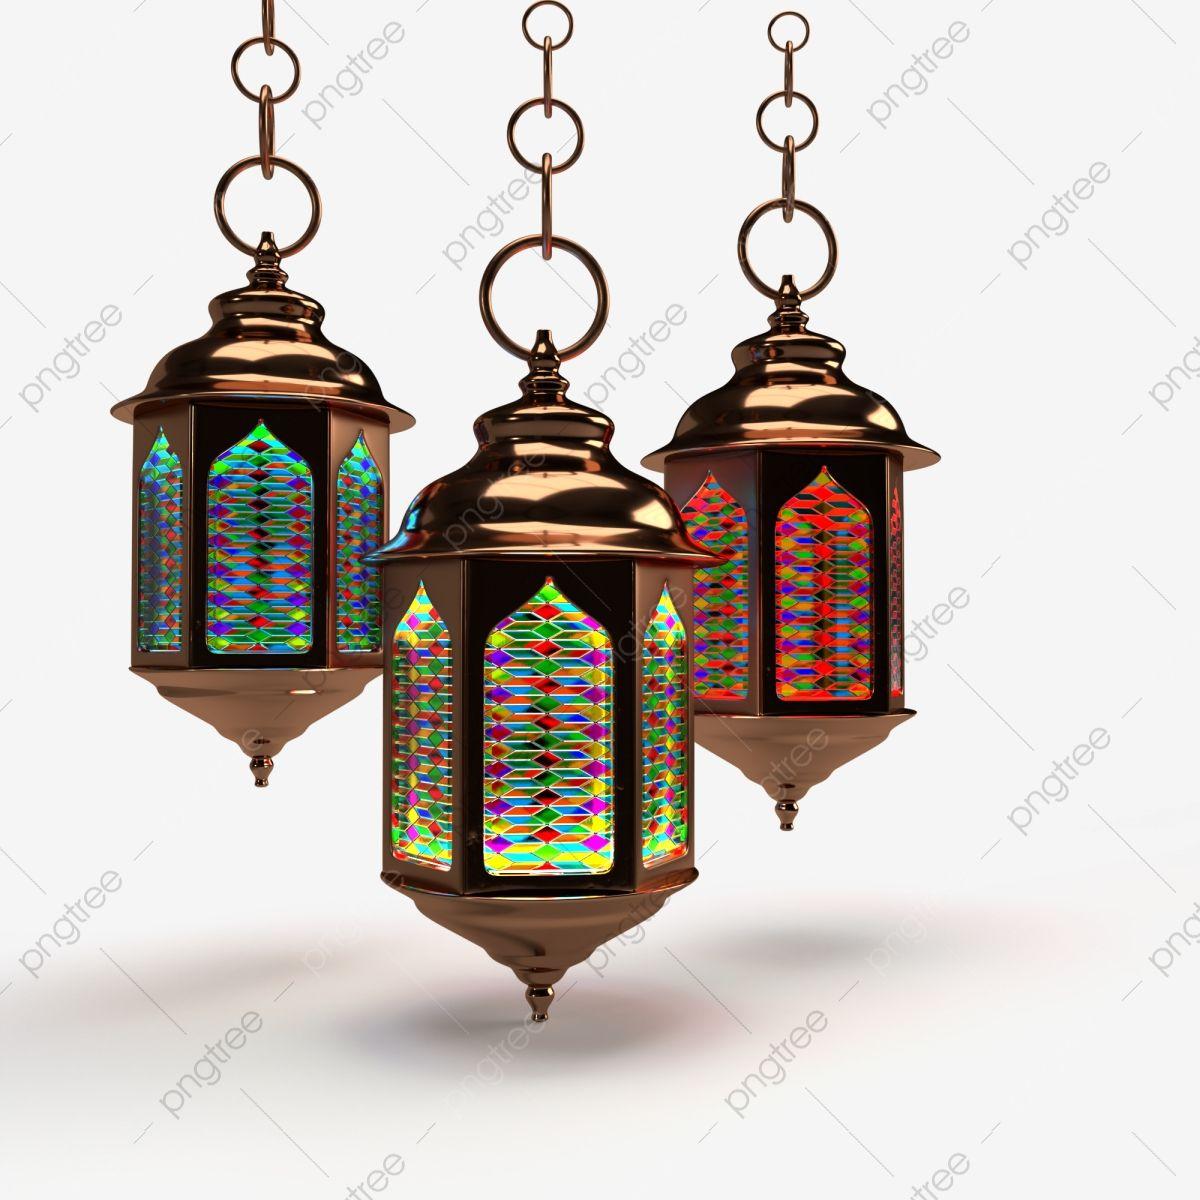 Eid Mubarak Ramadan Kareem Islamic Muslim Holiday Background With Lantern Or Lamp Eid Adha Al Png Transparent Clipart Image And Psd File For Free Download In 2020 Muslim Holidays Ramadan Kareem